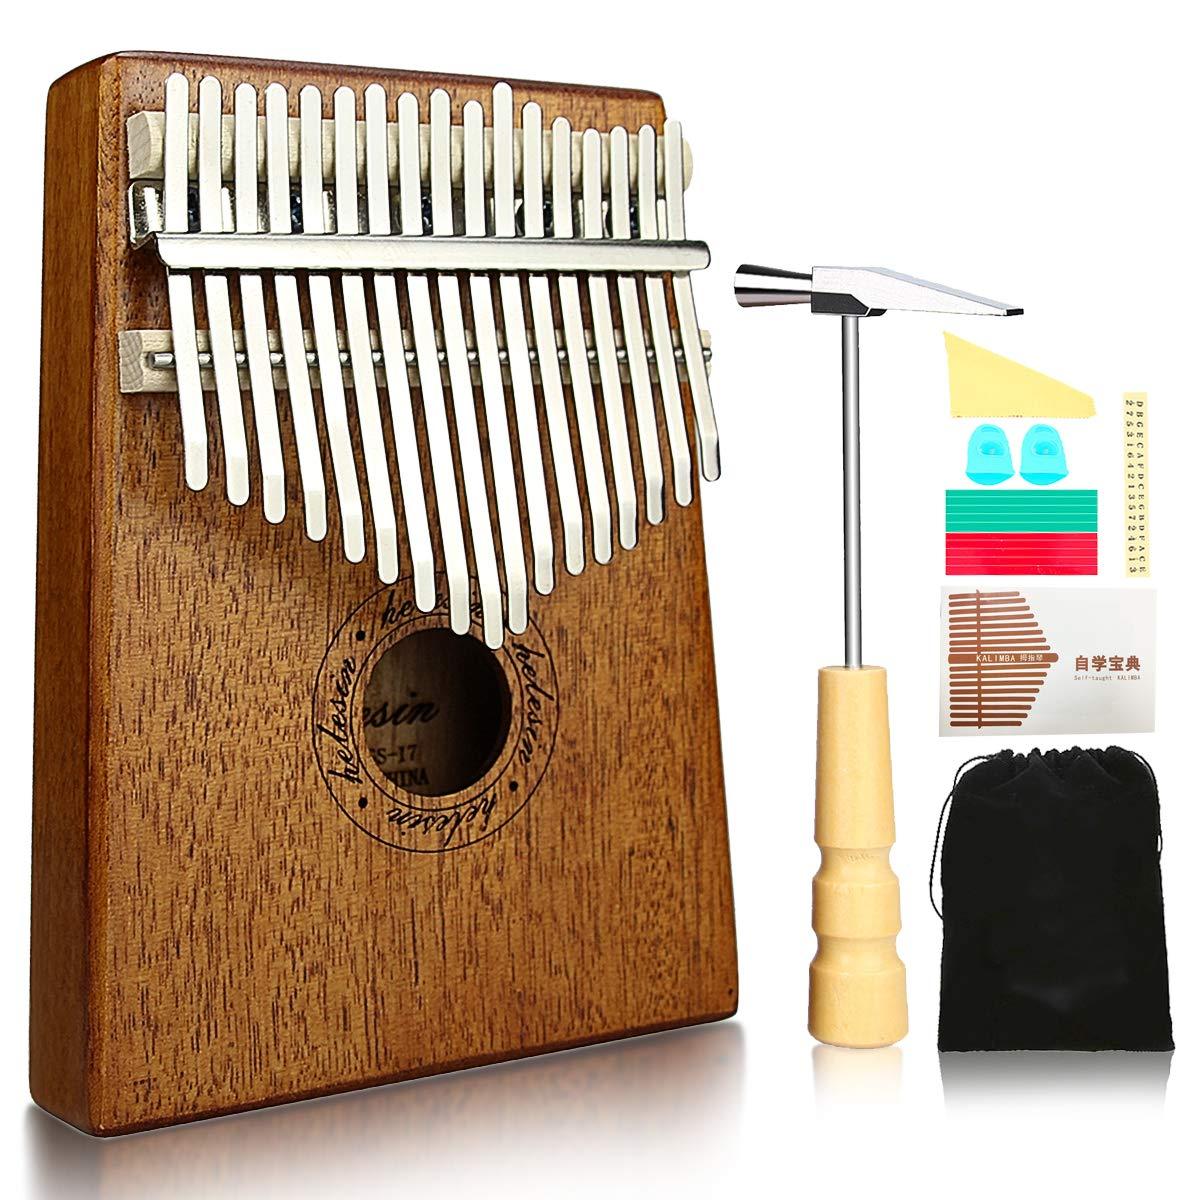 Kalimba, Helesin 17 key Thumb Piano Solid Finger Piano with Locking system, Instruction and Tune Hammer Marímbula Mbira Wood Natural Keyboard Marimba (Mahogany)